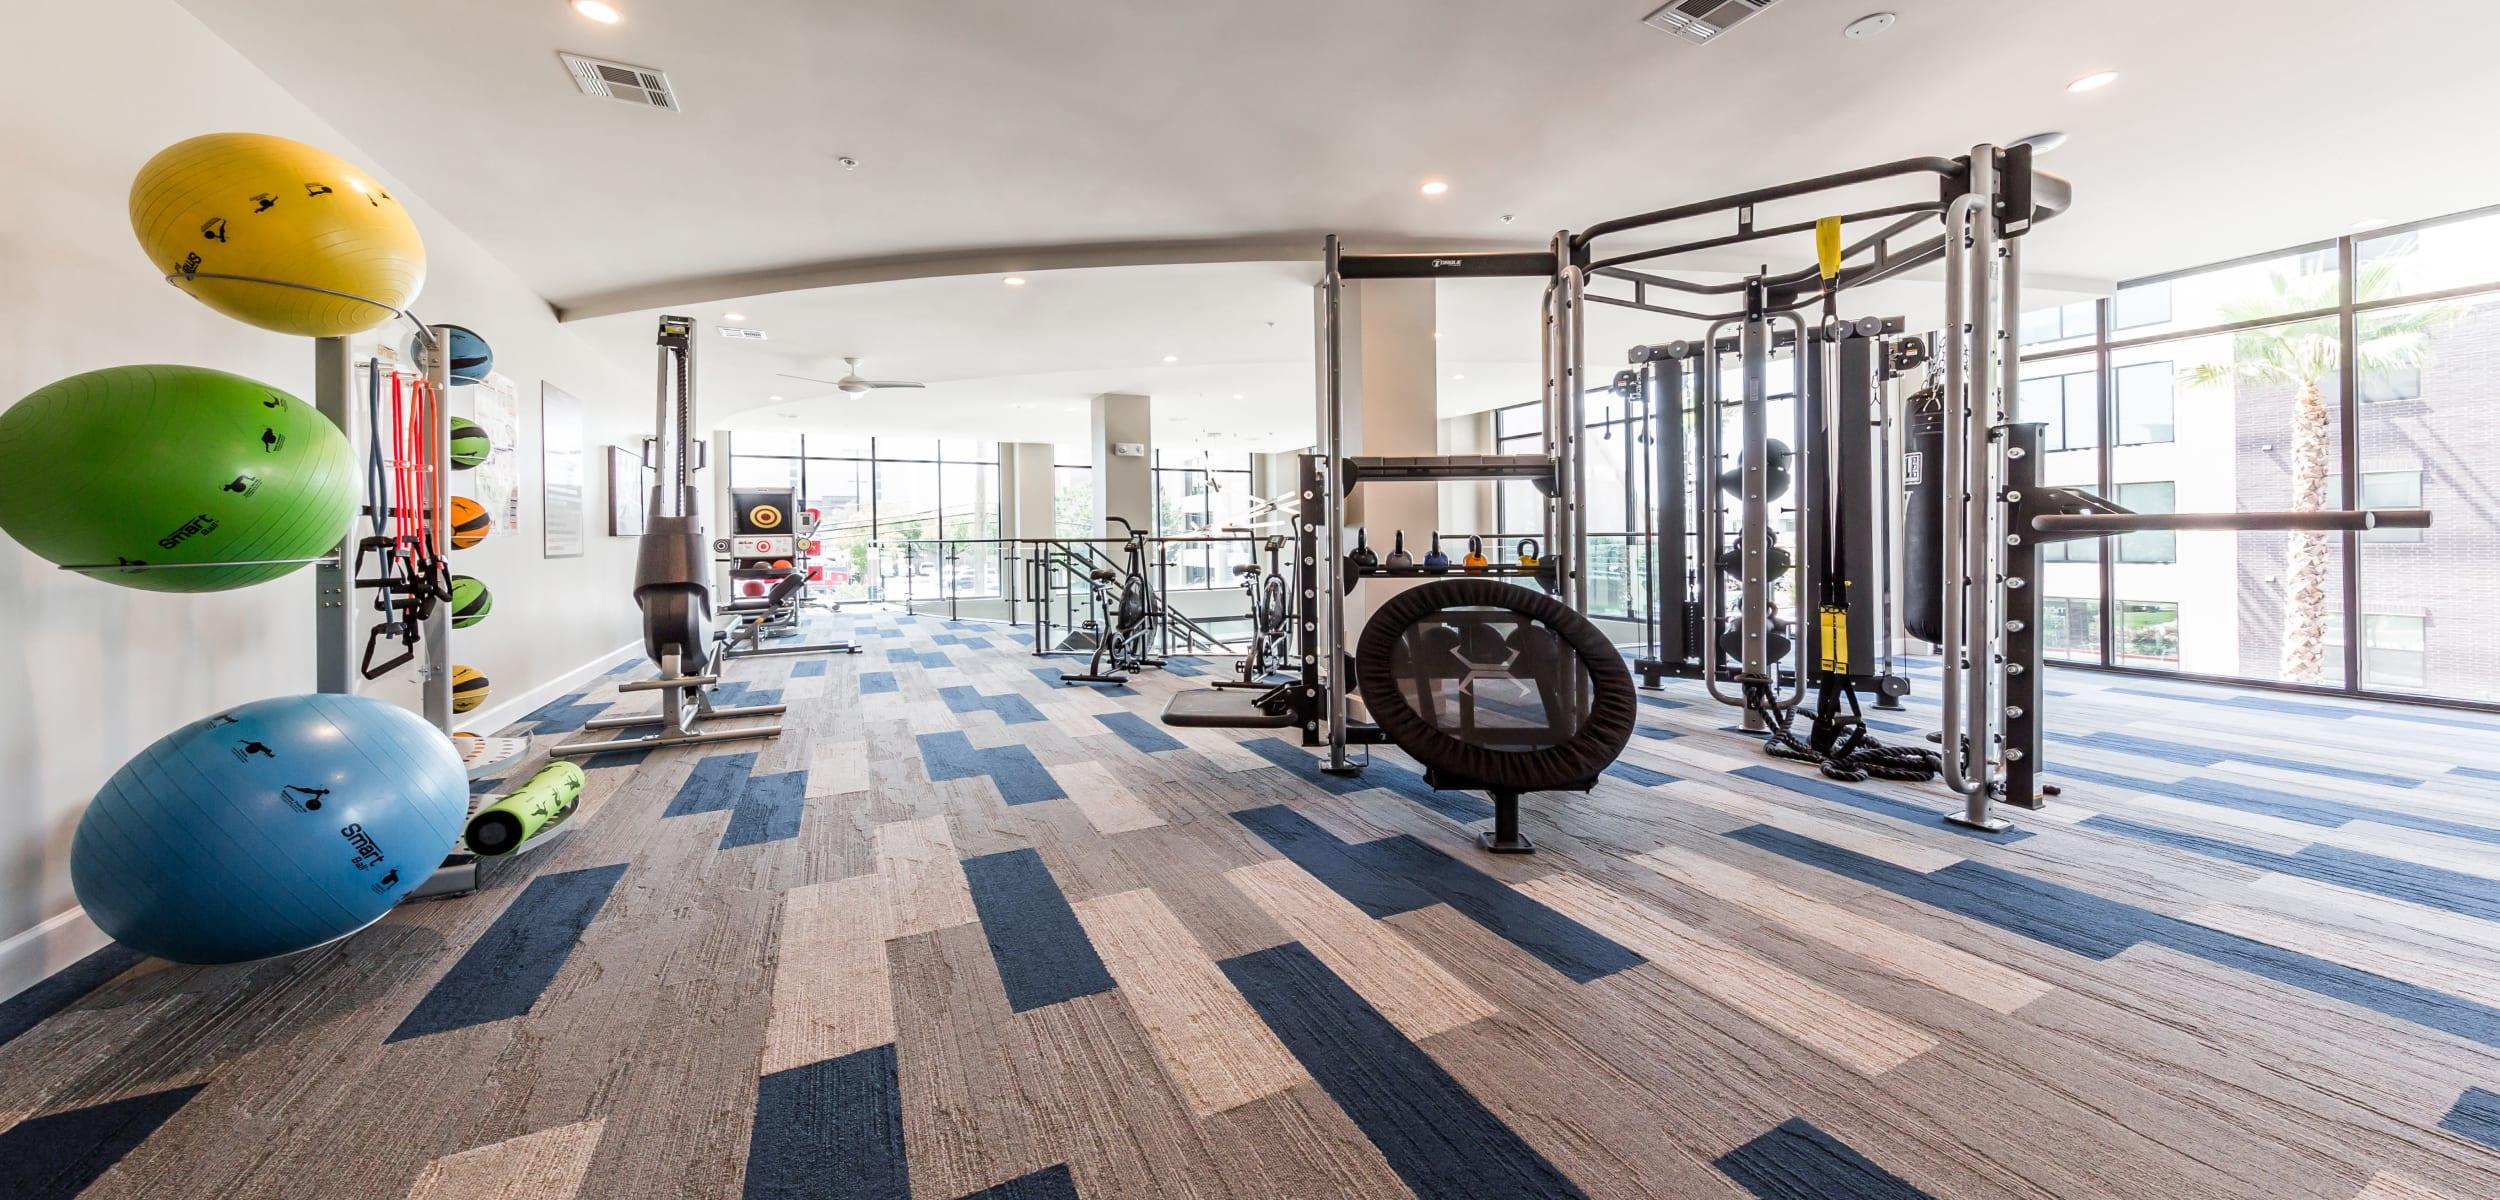 Marq 31's fitness center in Houston, Texas